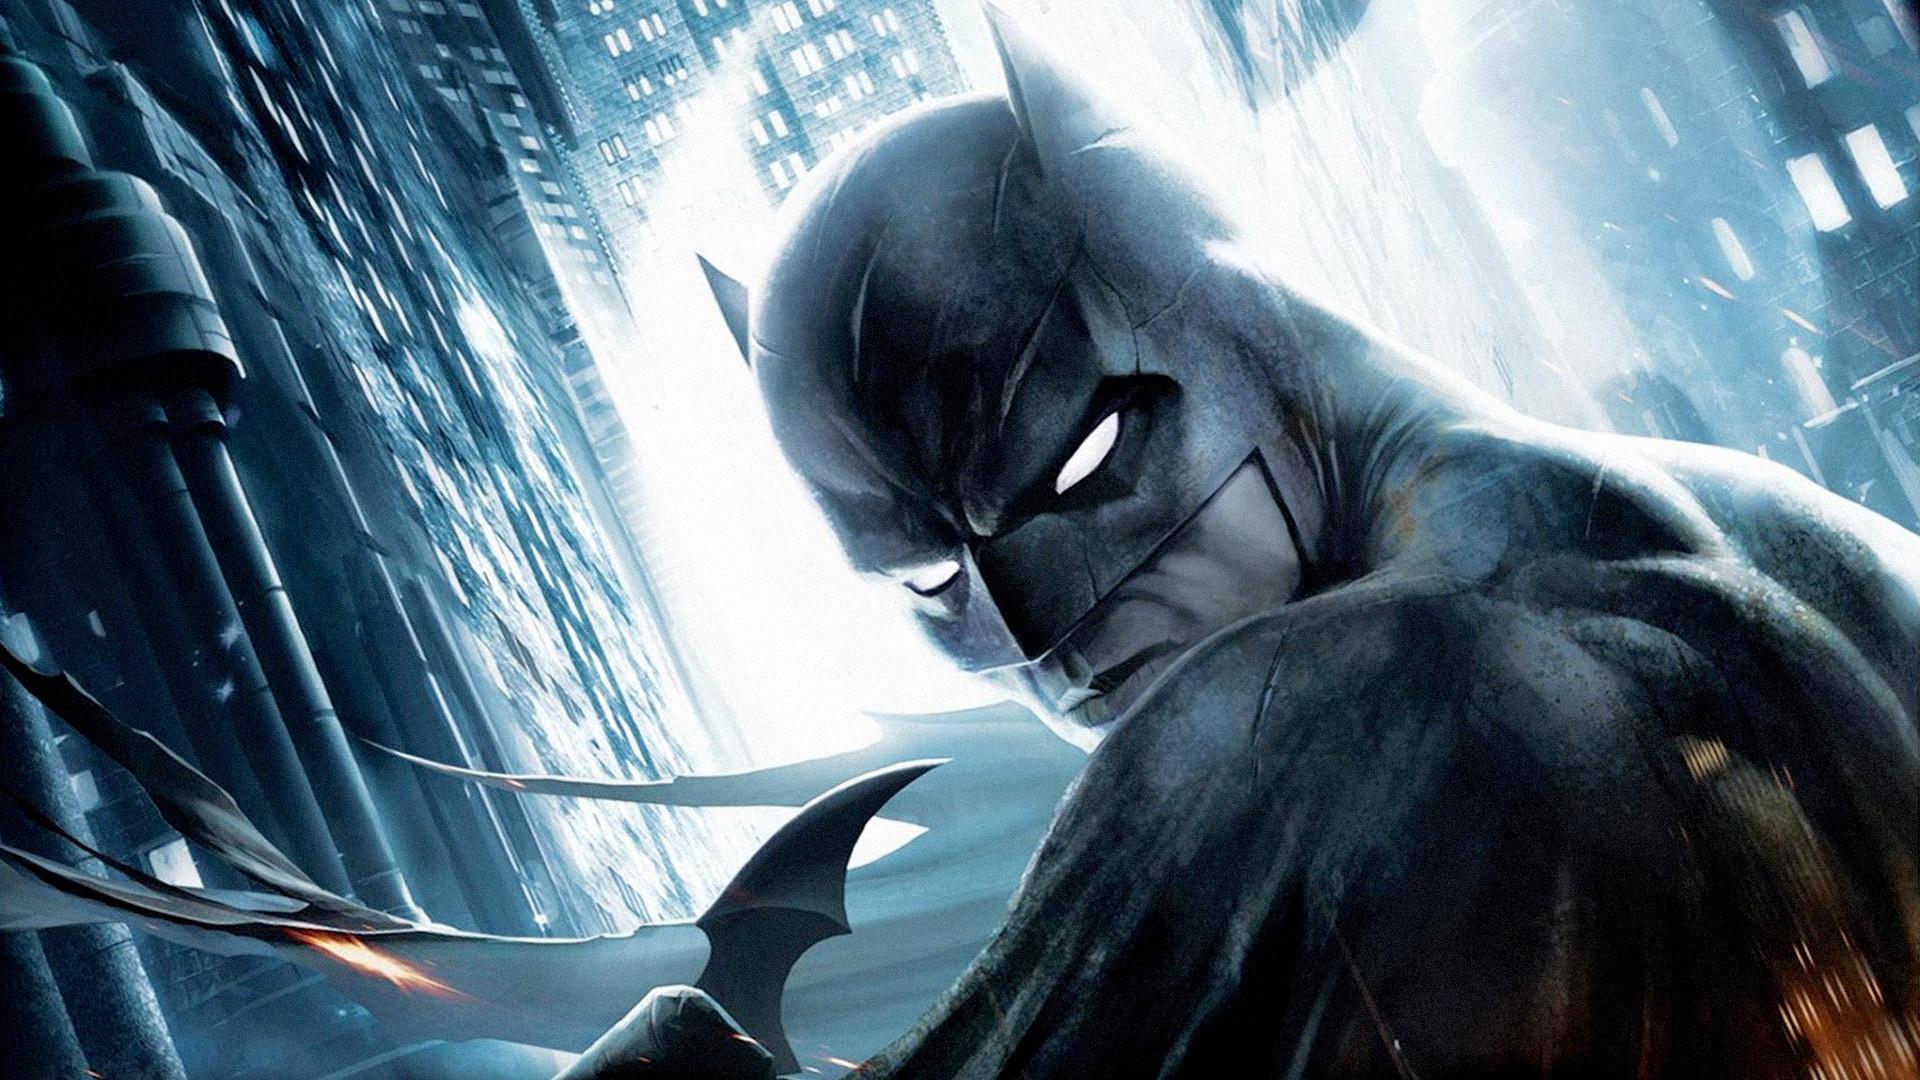 Batman: The Dark Knight Returns, Part 1 image